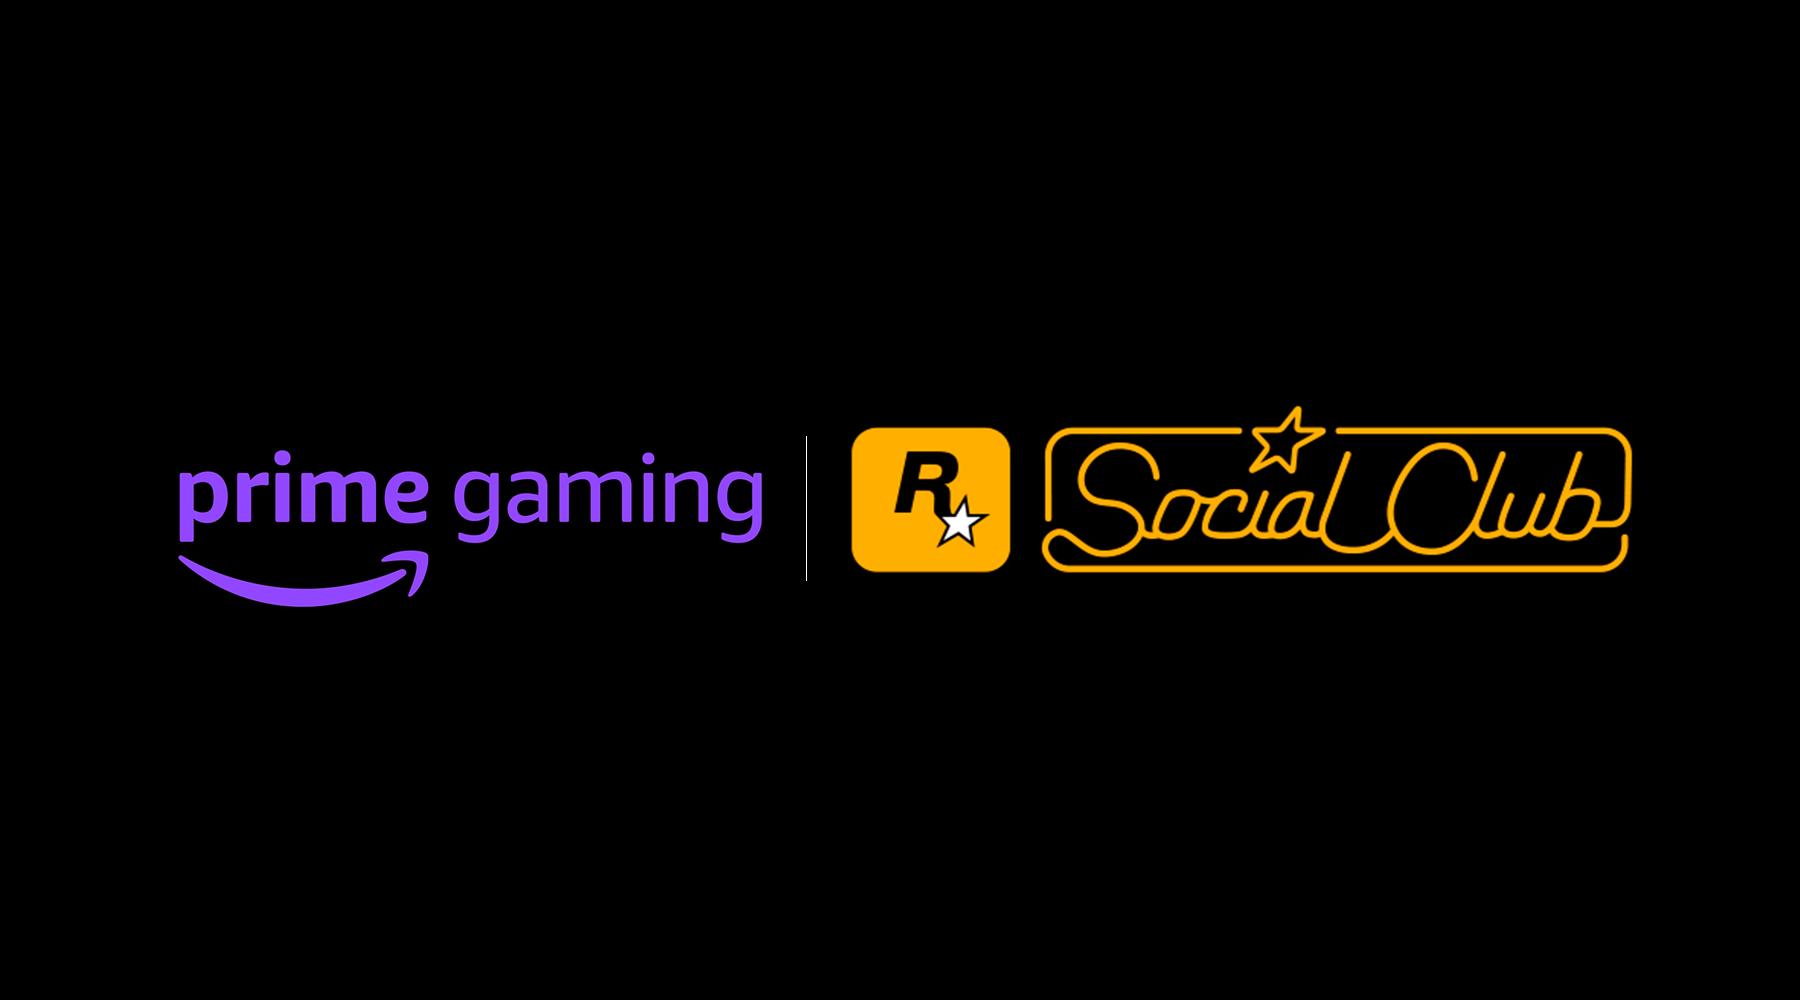 GTA weekly September 3rd-9th 2020 prime gaming social club collaboration